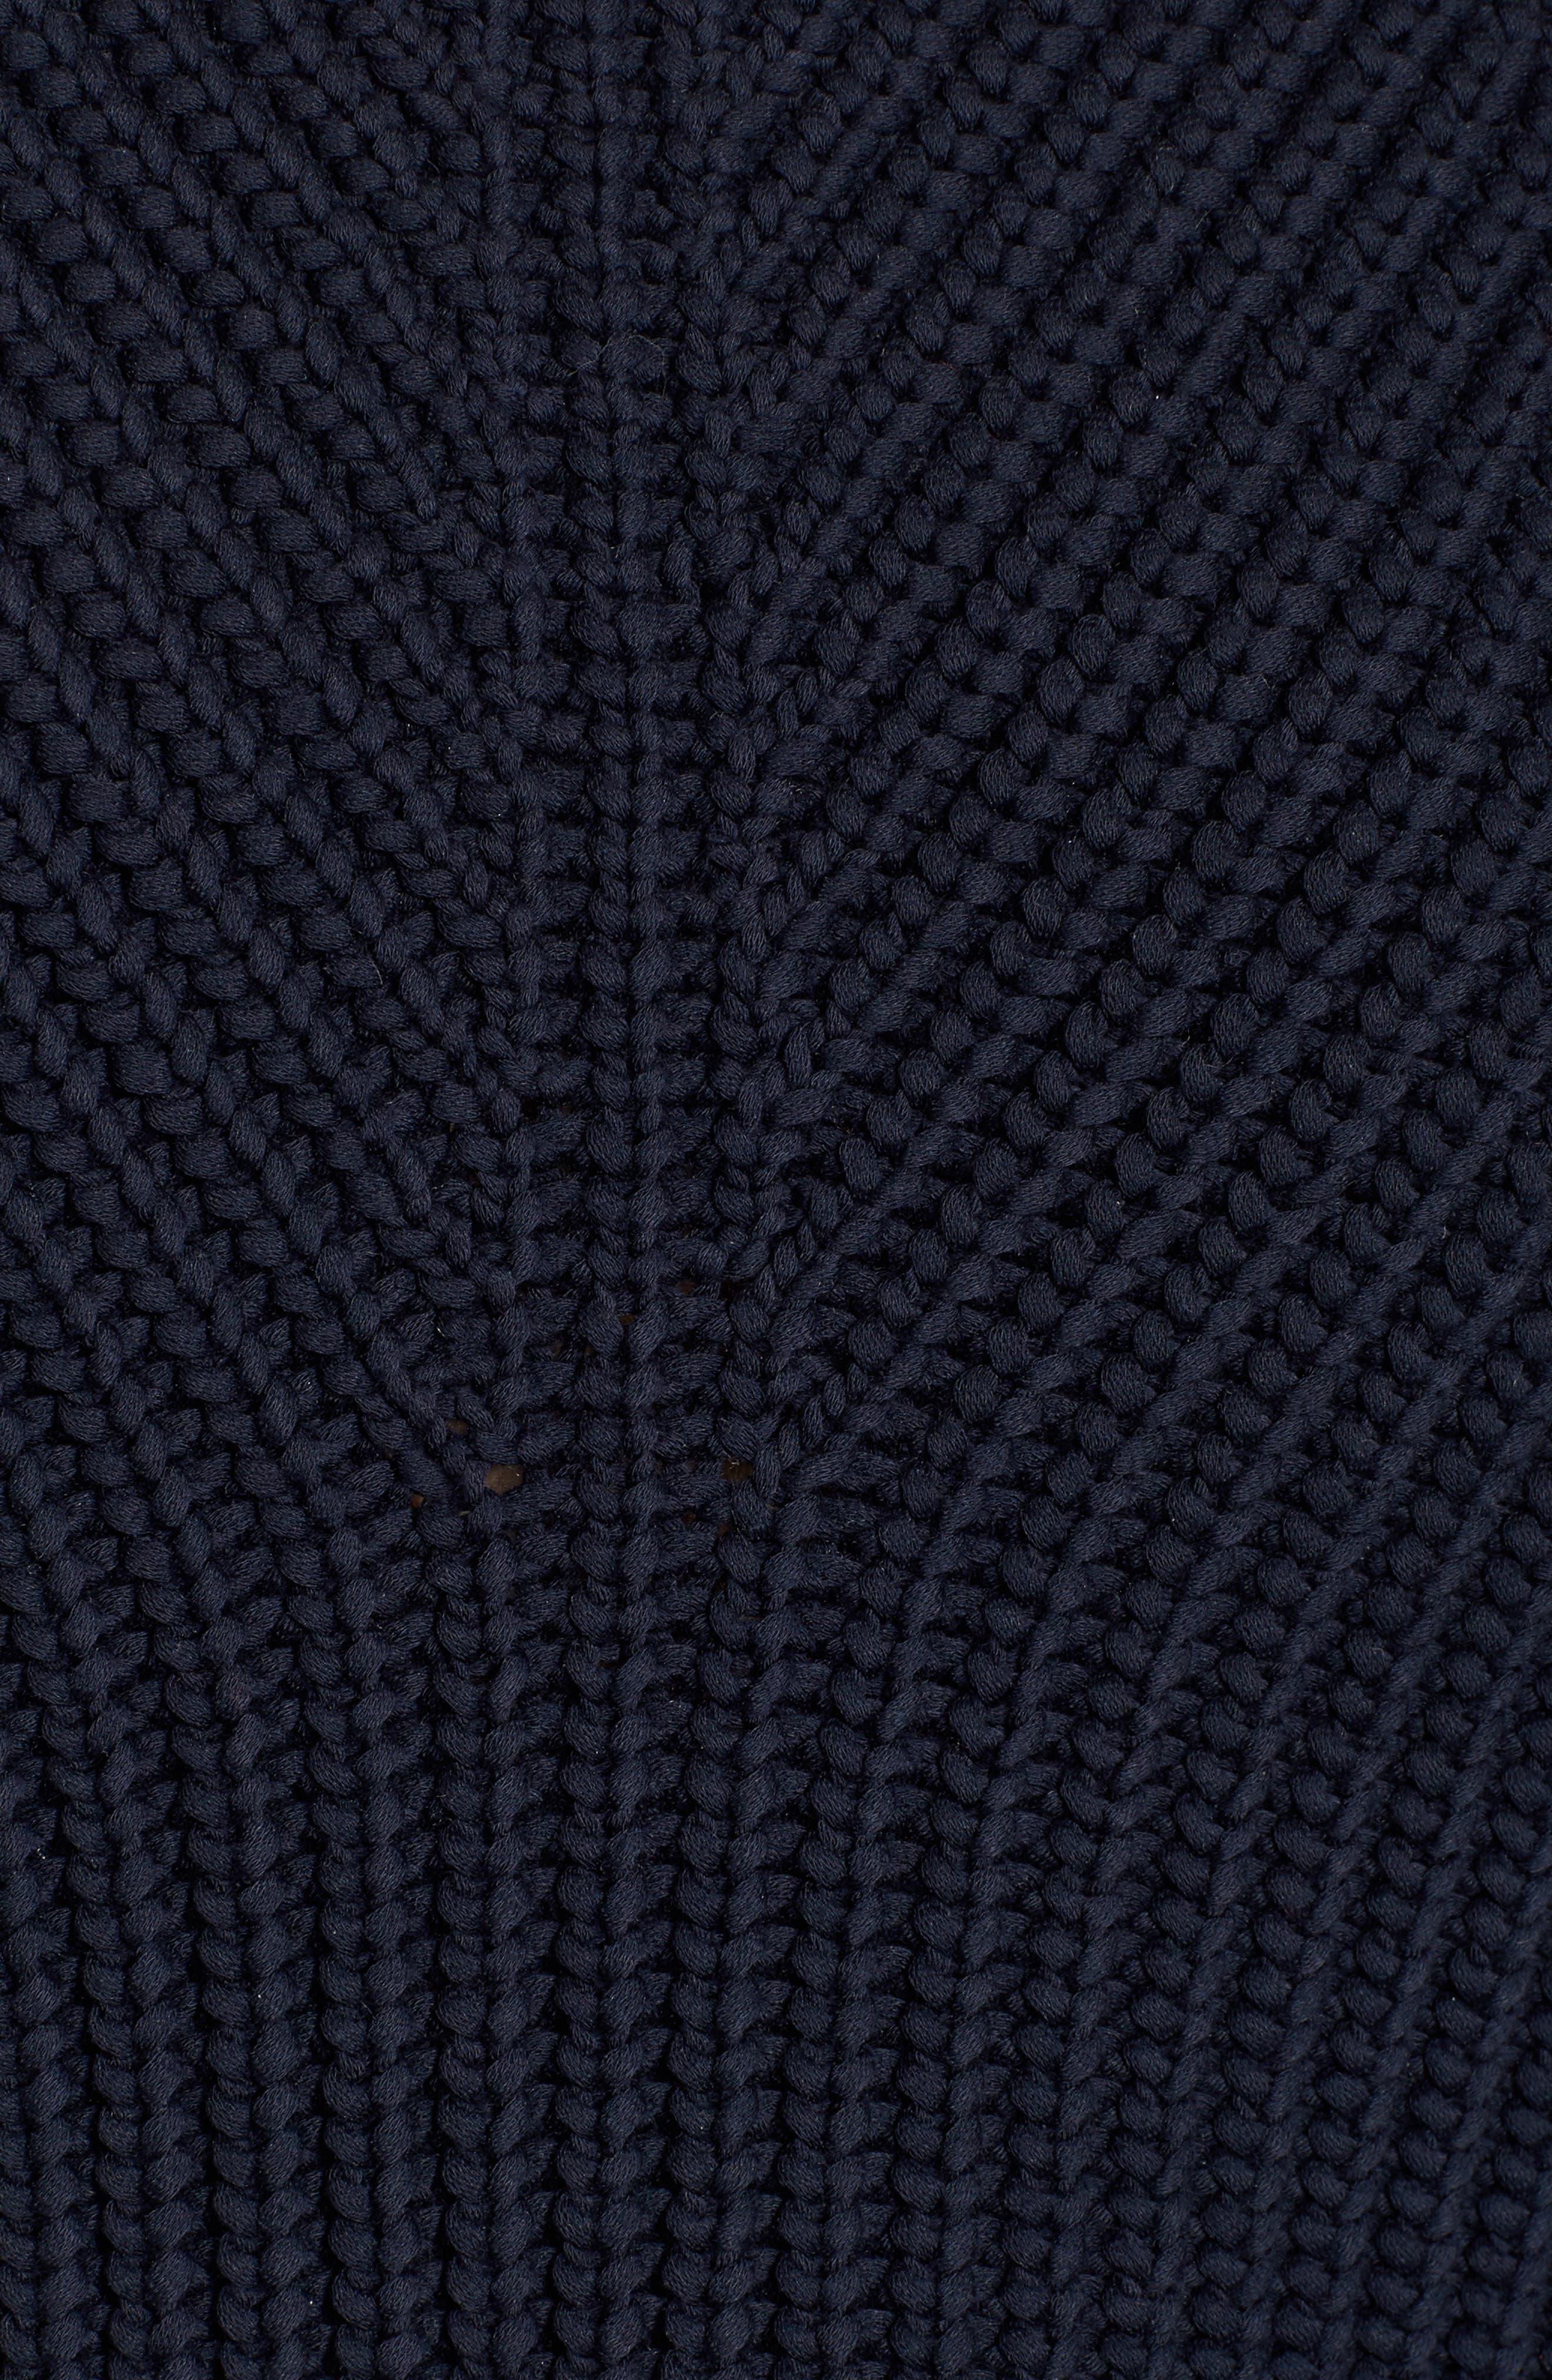 Raglan Sleeve Knit Sweater,                             Alternate thumbnail 5, color,                             Navy Night